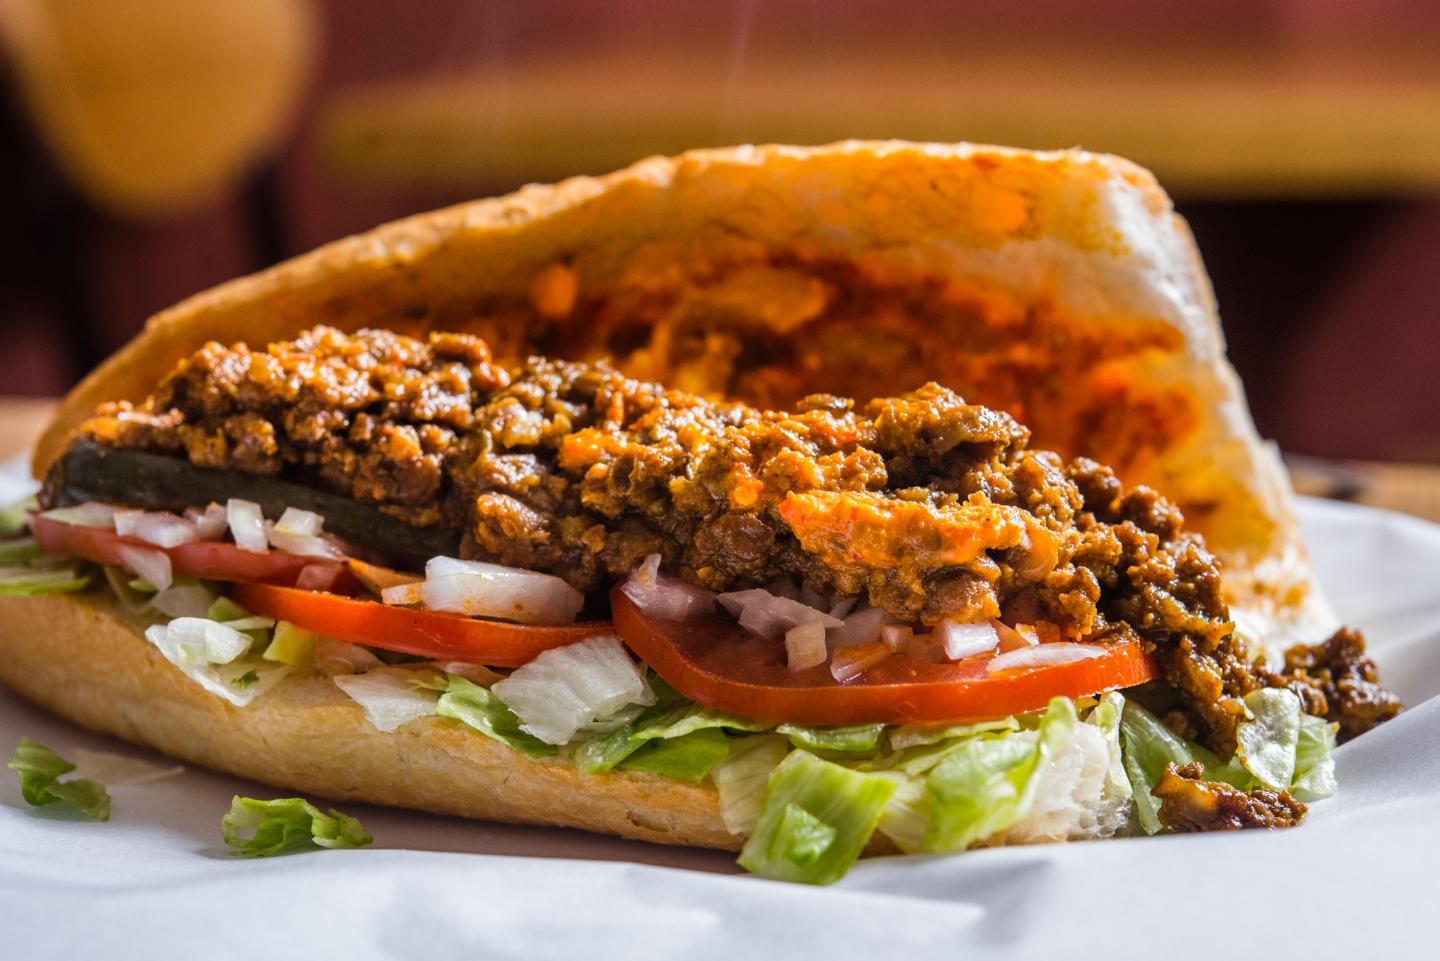 Casablanca in Haebangchon, Habid Naciri, Moroccan sandwiches, lamb, chicken, Haebangchon, Seoul